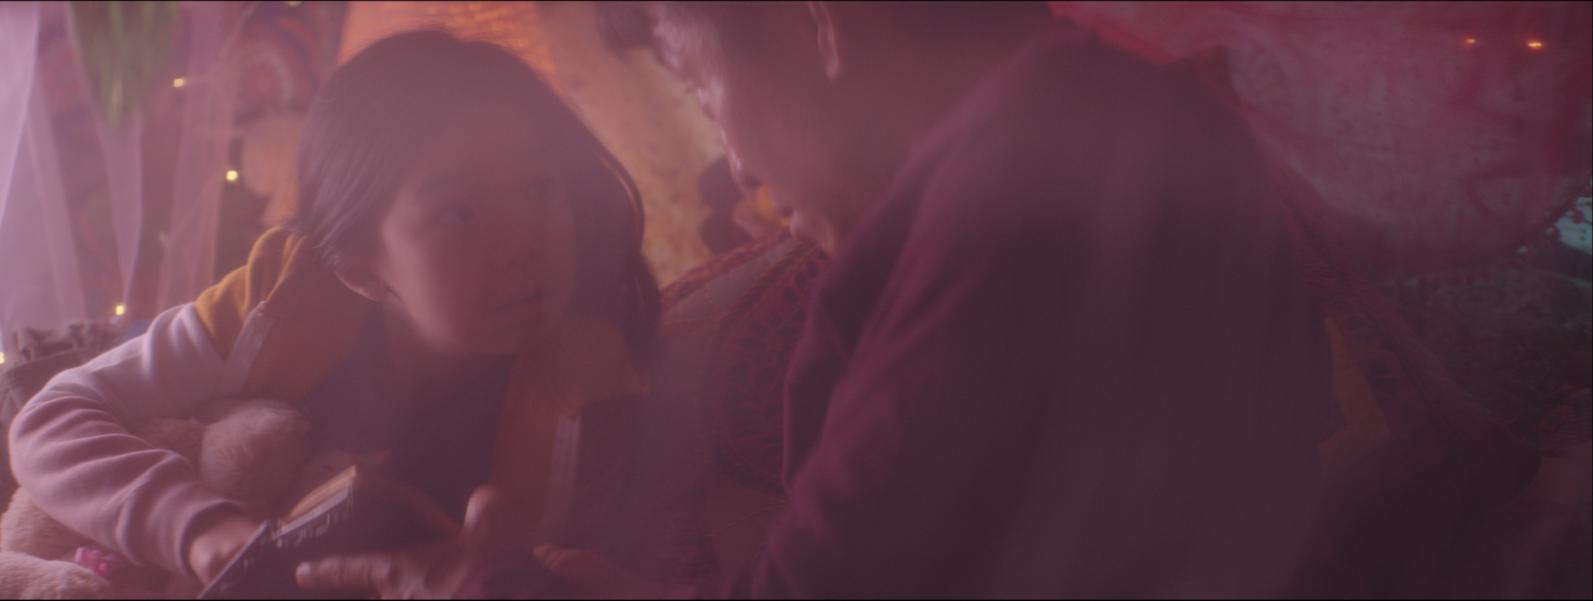 Moonchild - Dir. Mimi Lee